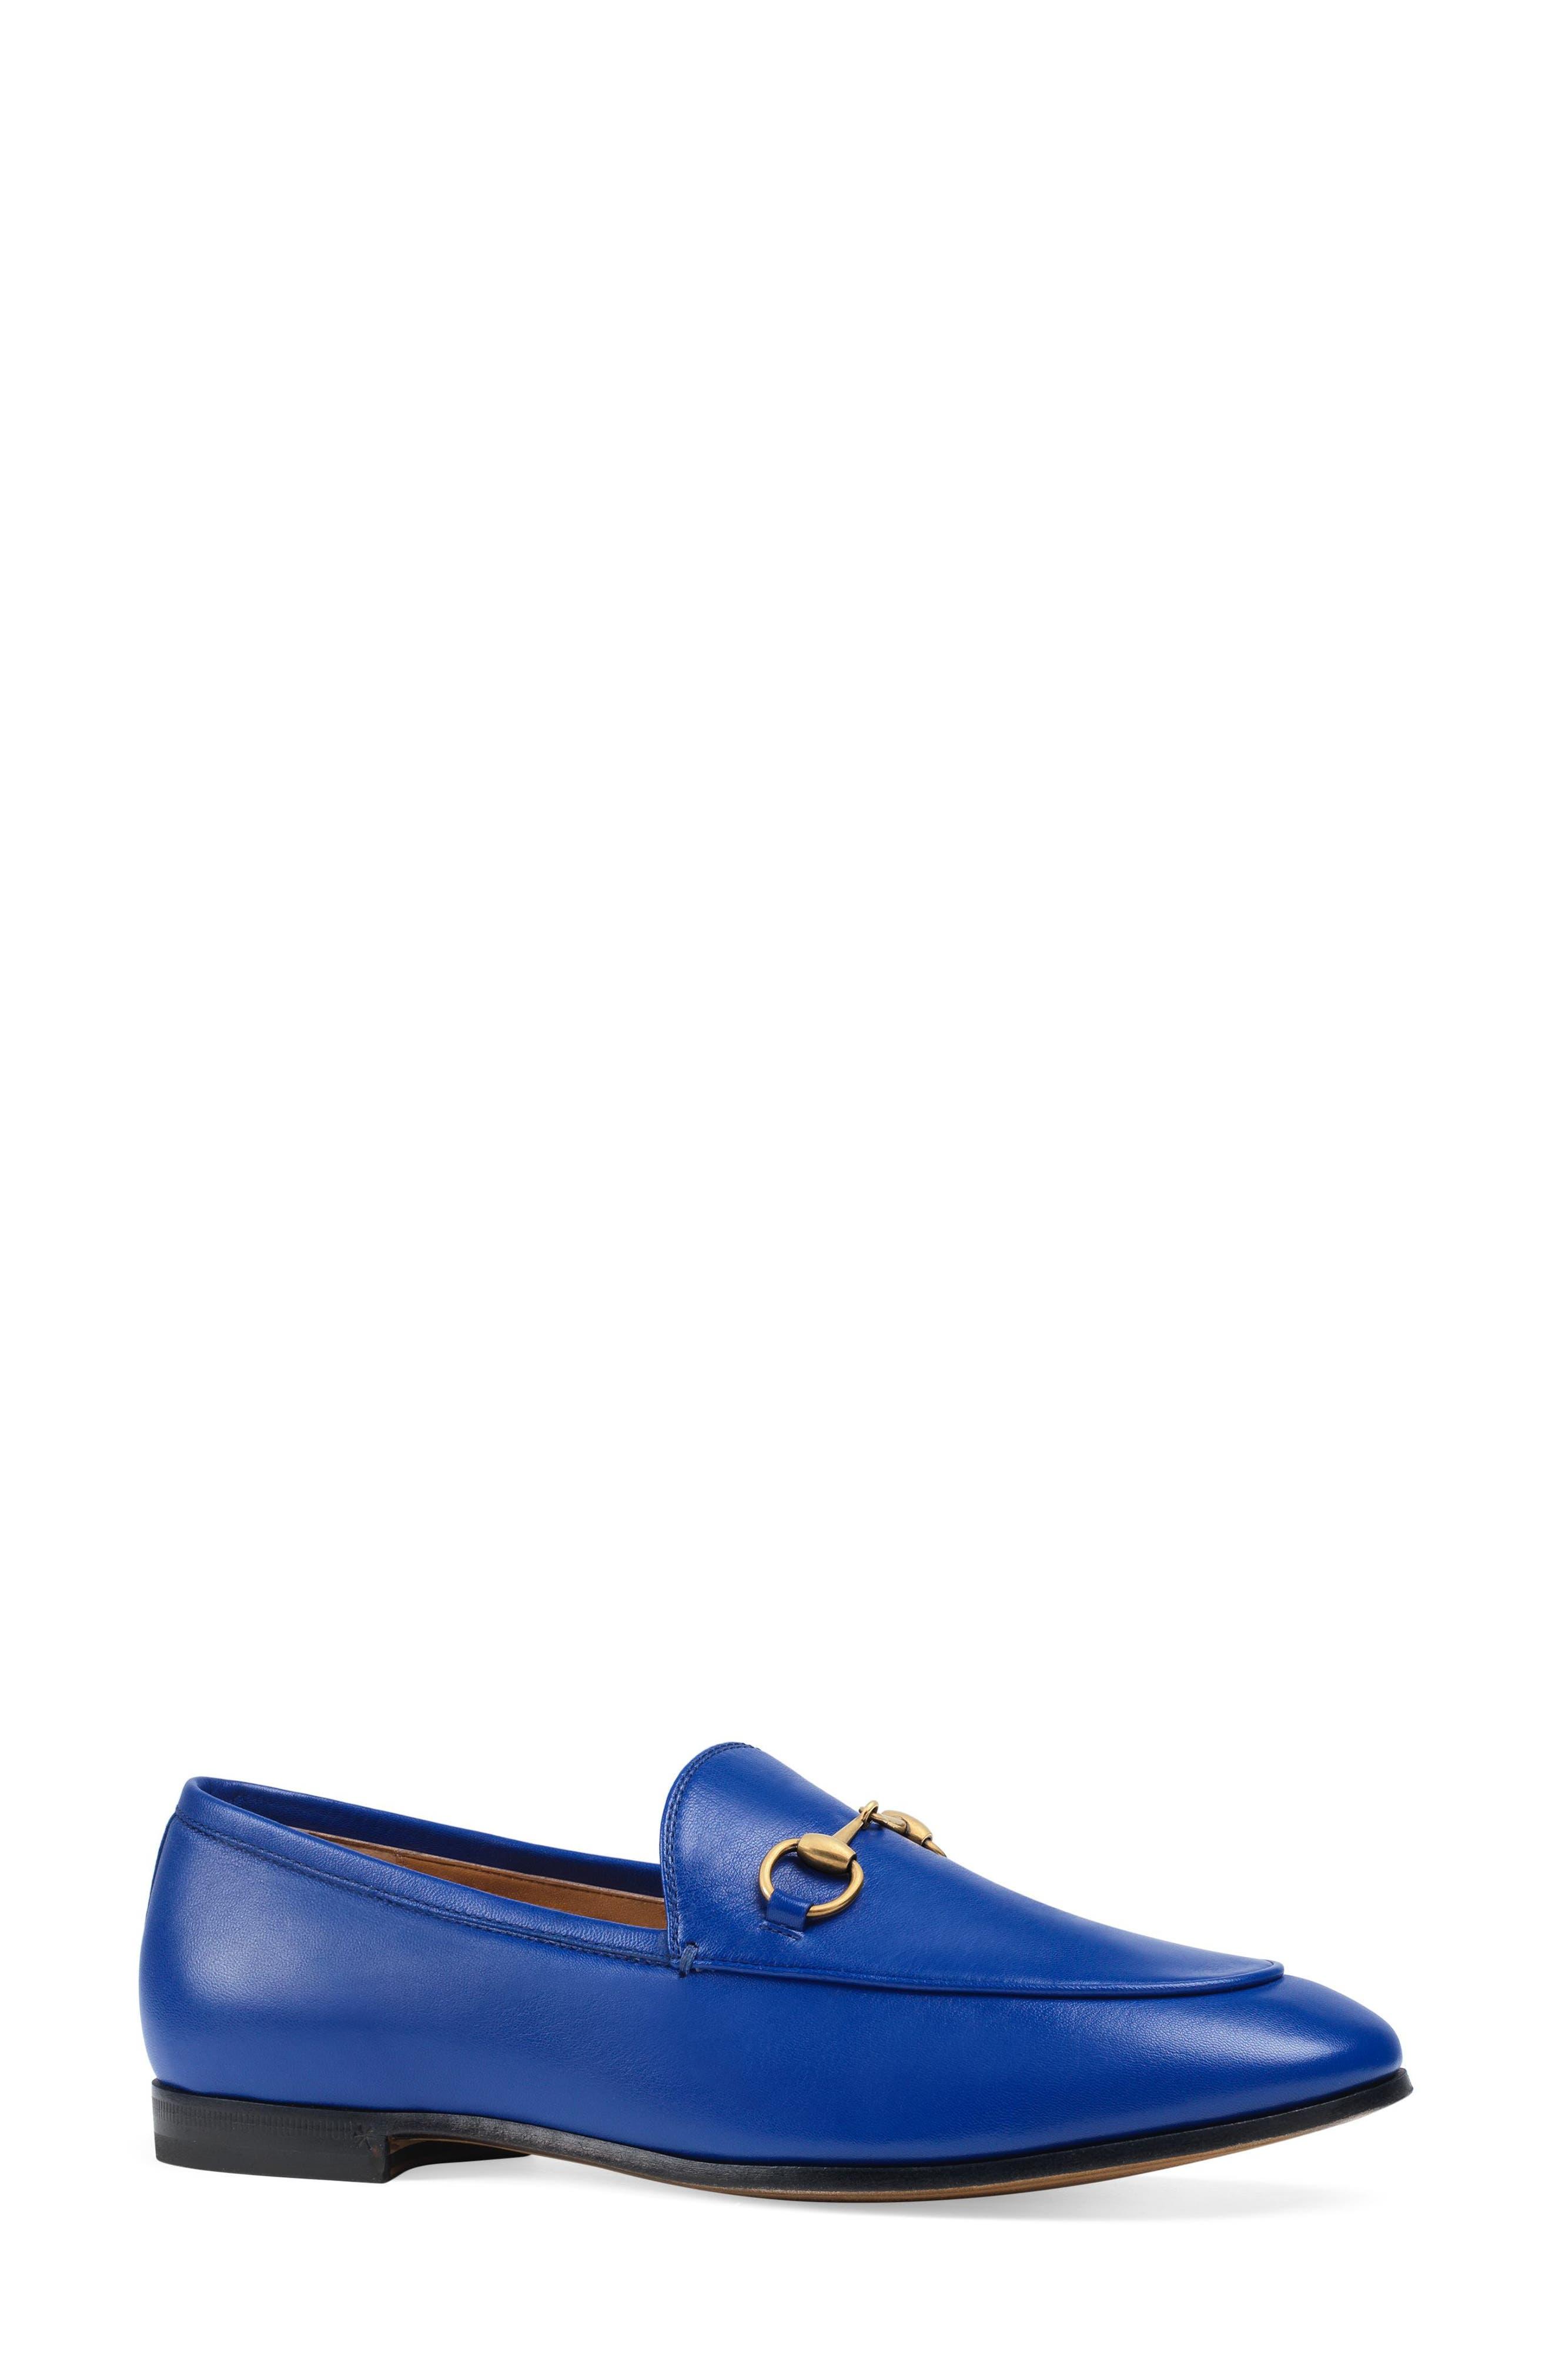 Alternate Image 1 Selected - Gucci 'Jordaan' Loafer (Women)